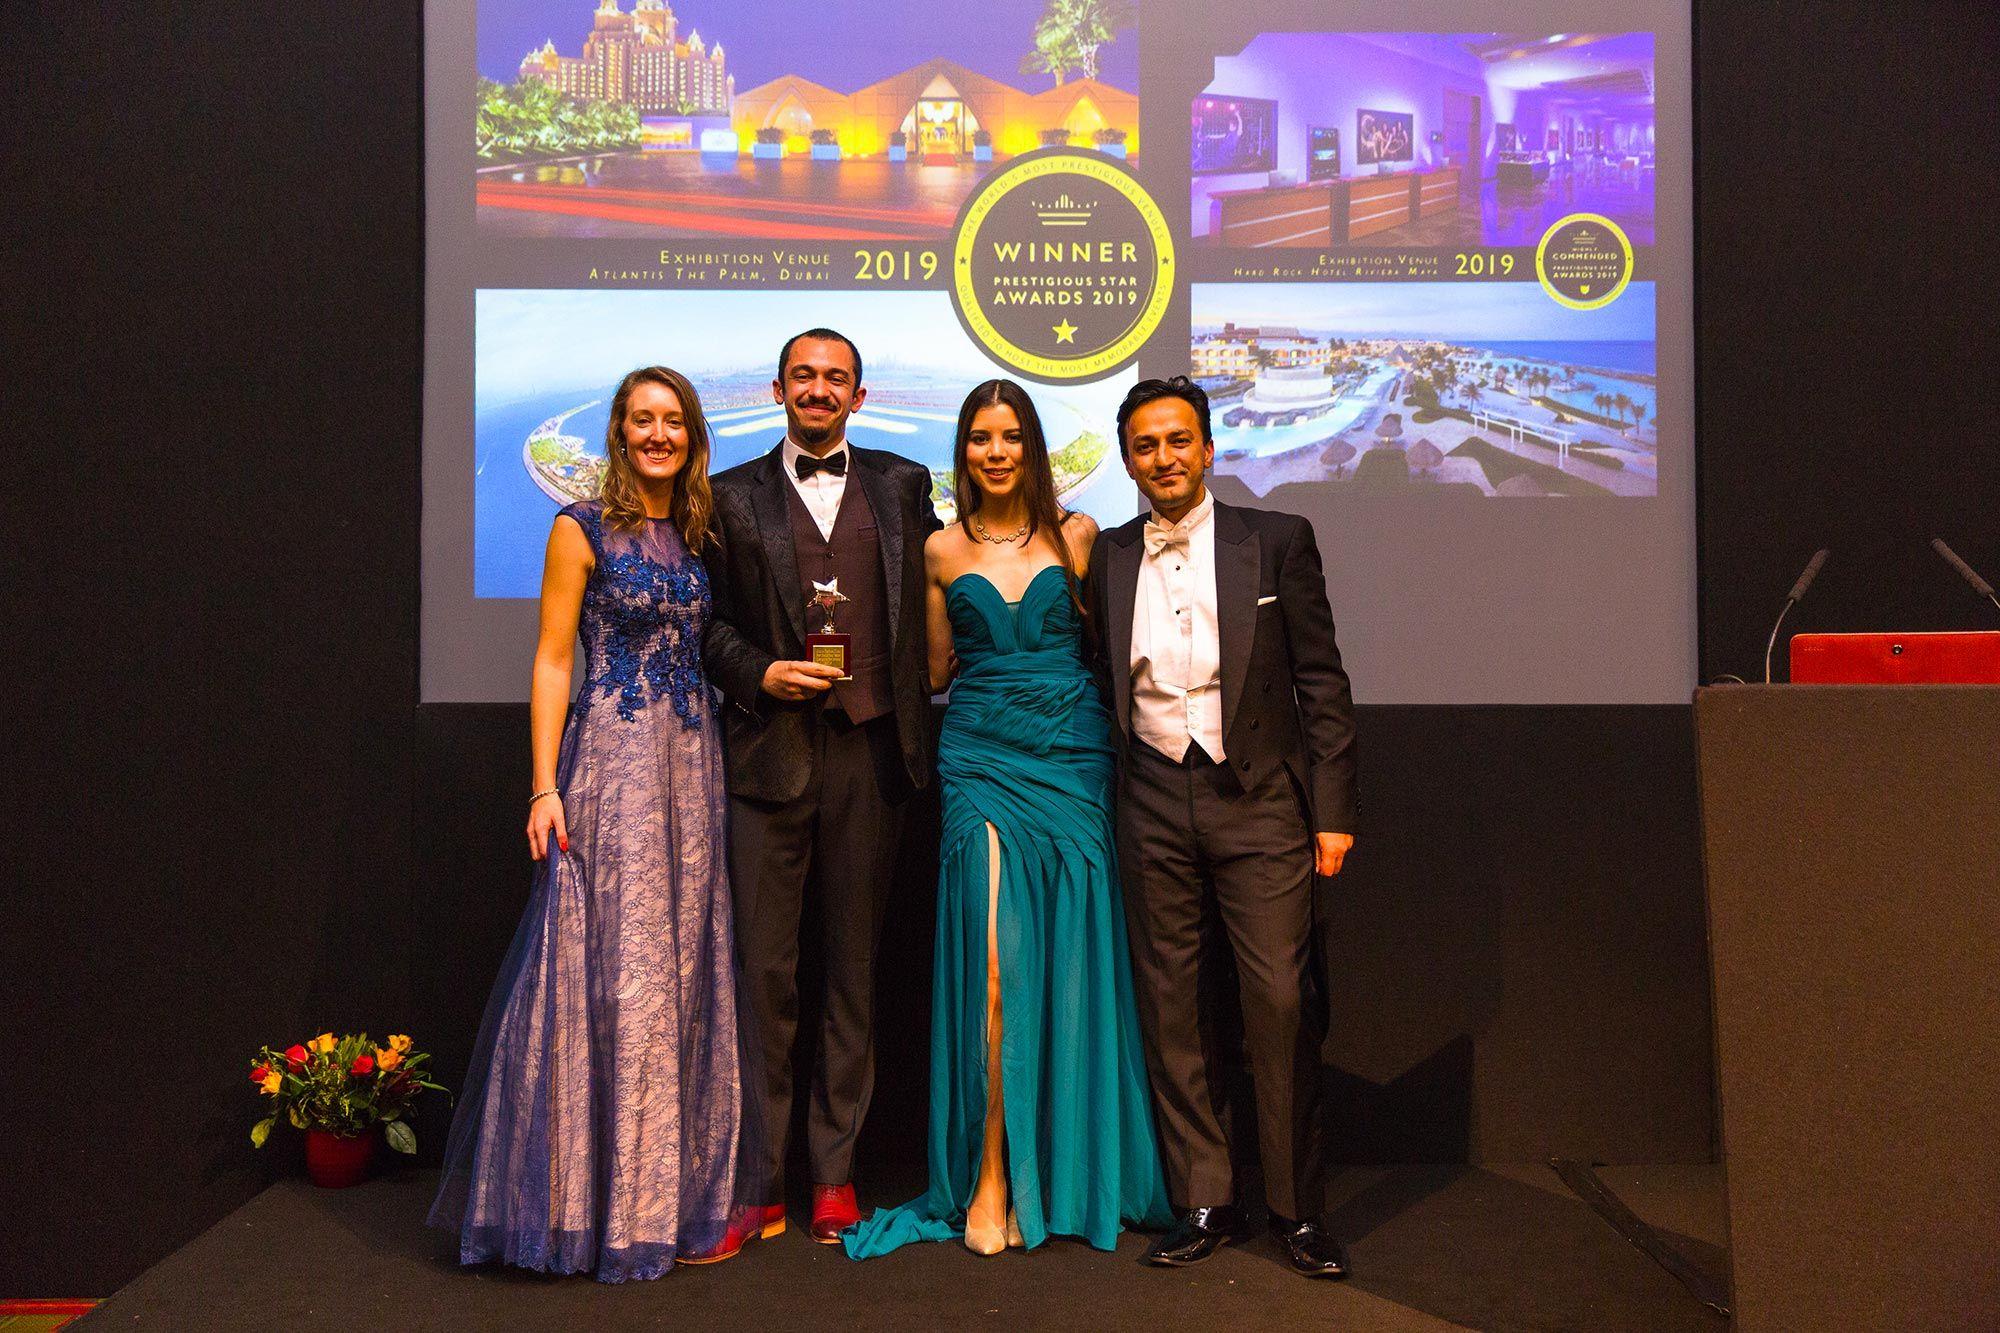 Prestigious Star Awards Grand Ball 2019, Prestigious Venues, 225